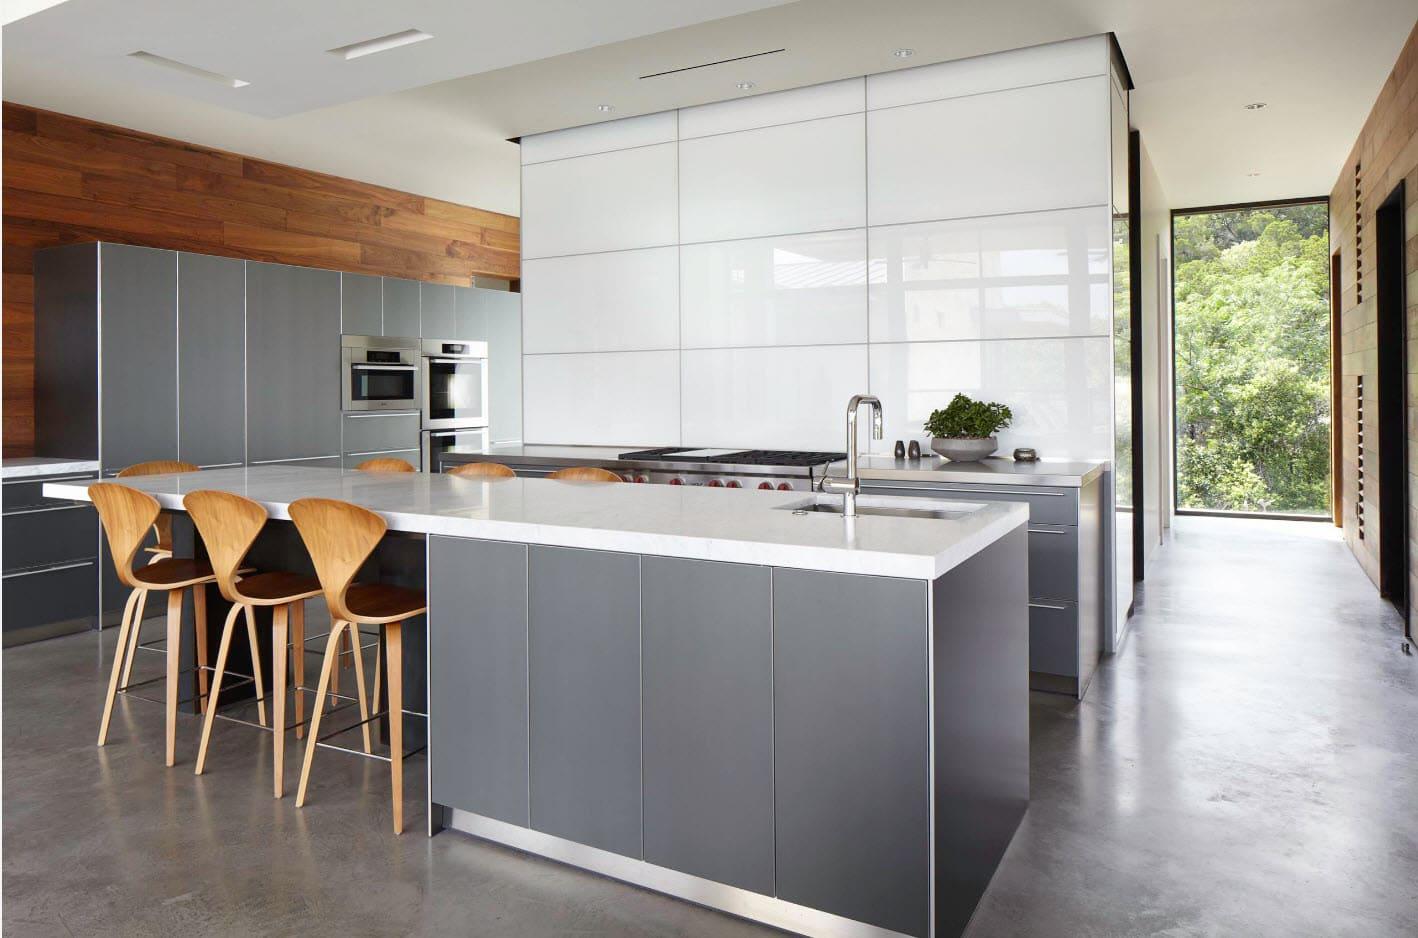 Стены кухни в стиле минимализм